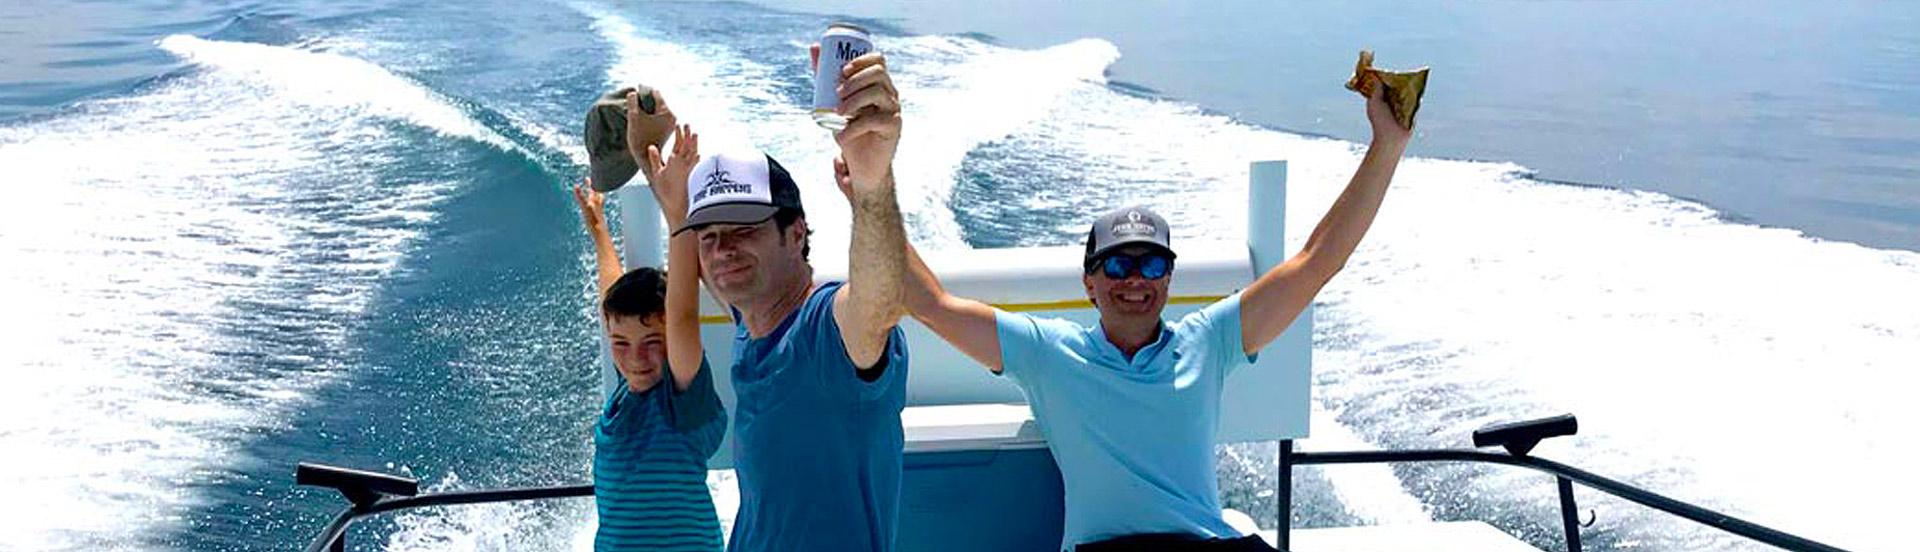 how to book a charter fishing trip in Santa Barbara